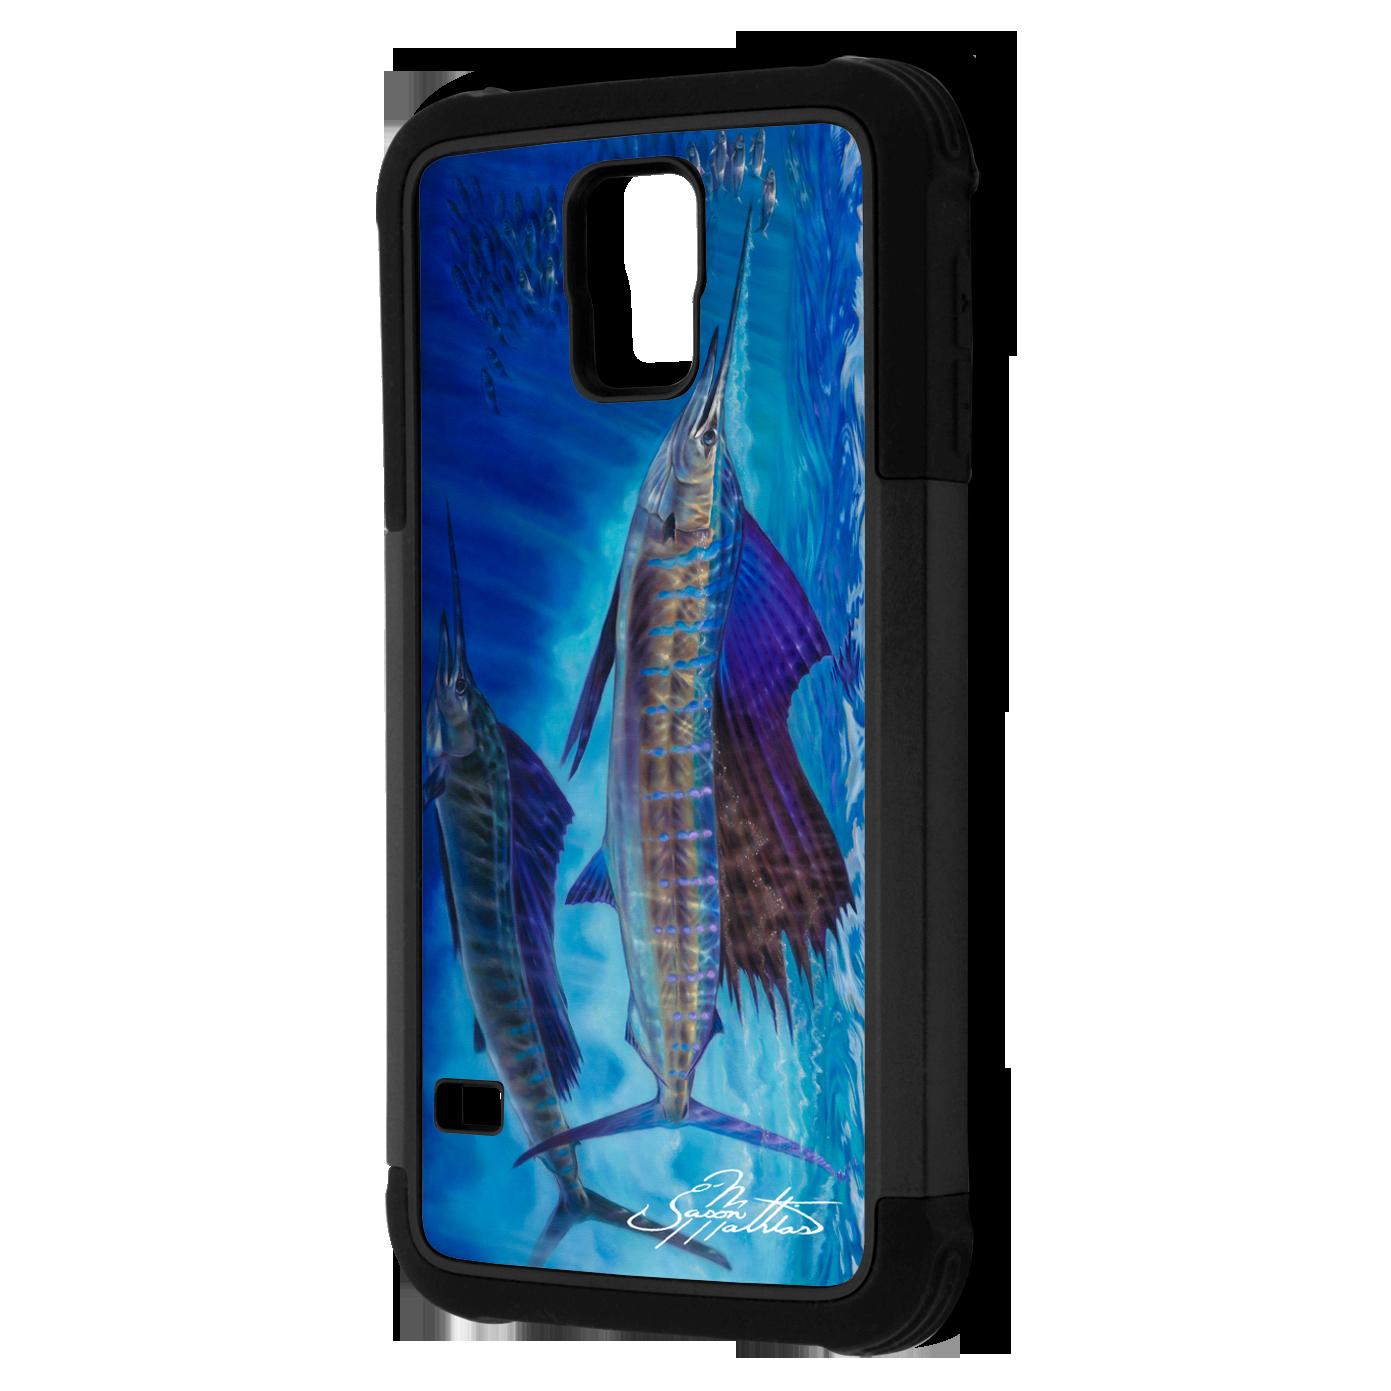 samsung-galaxy-s5-jason-mathias-sailfish.png